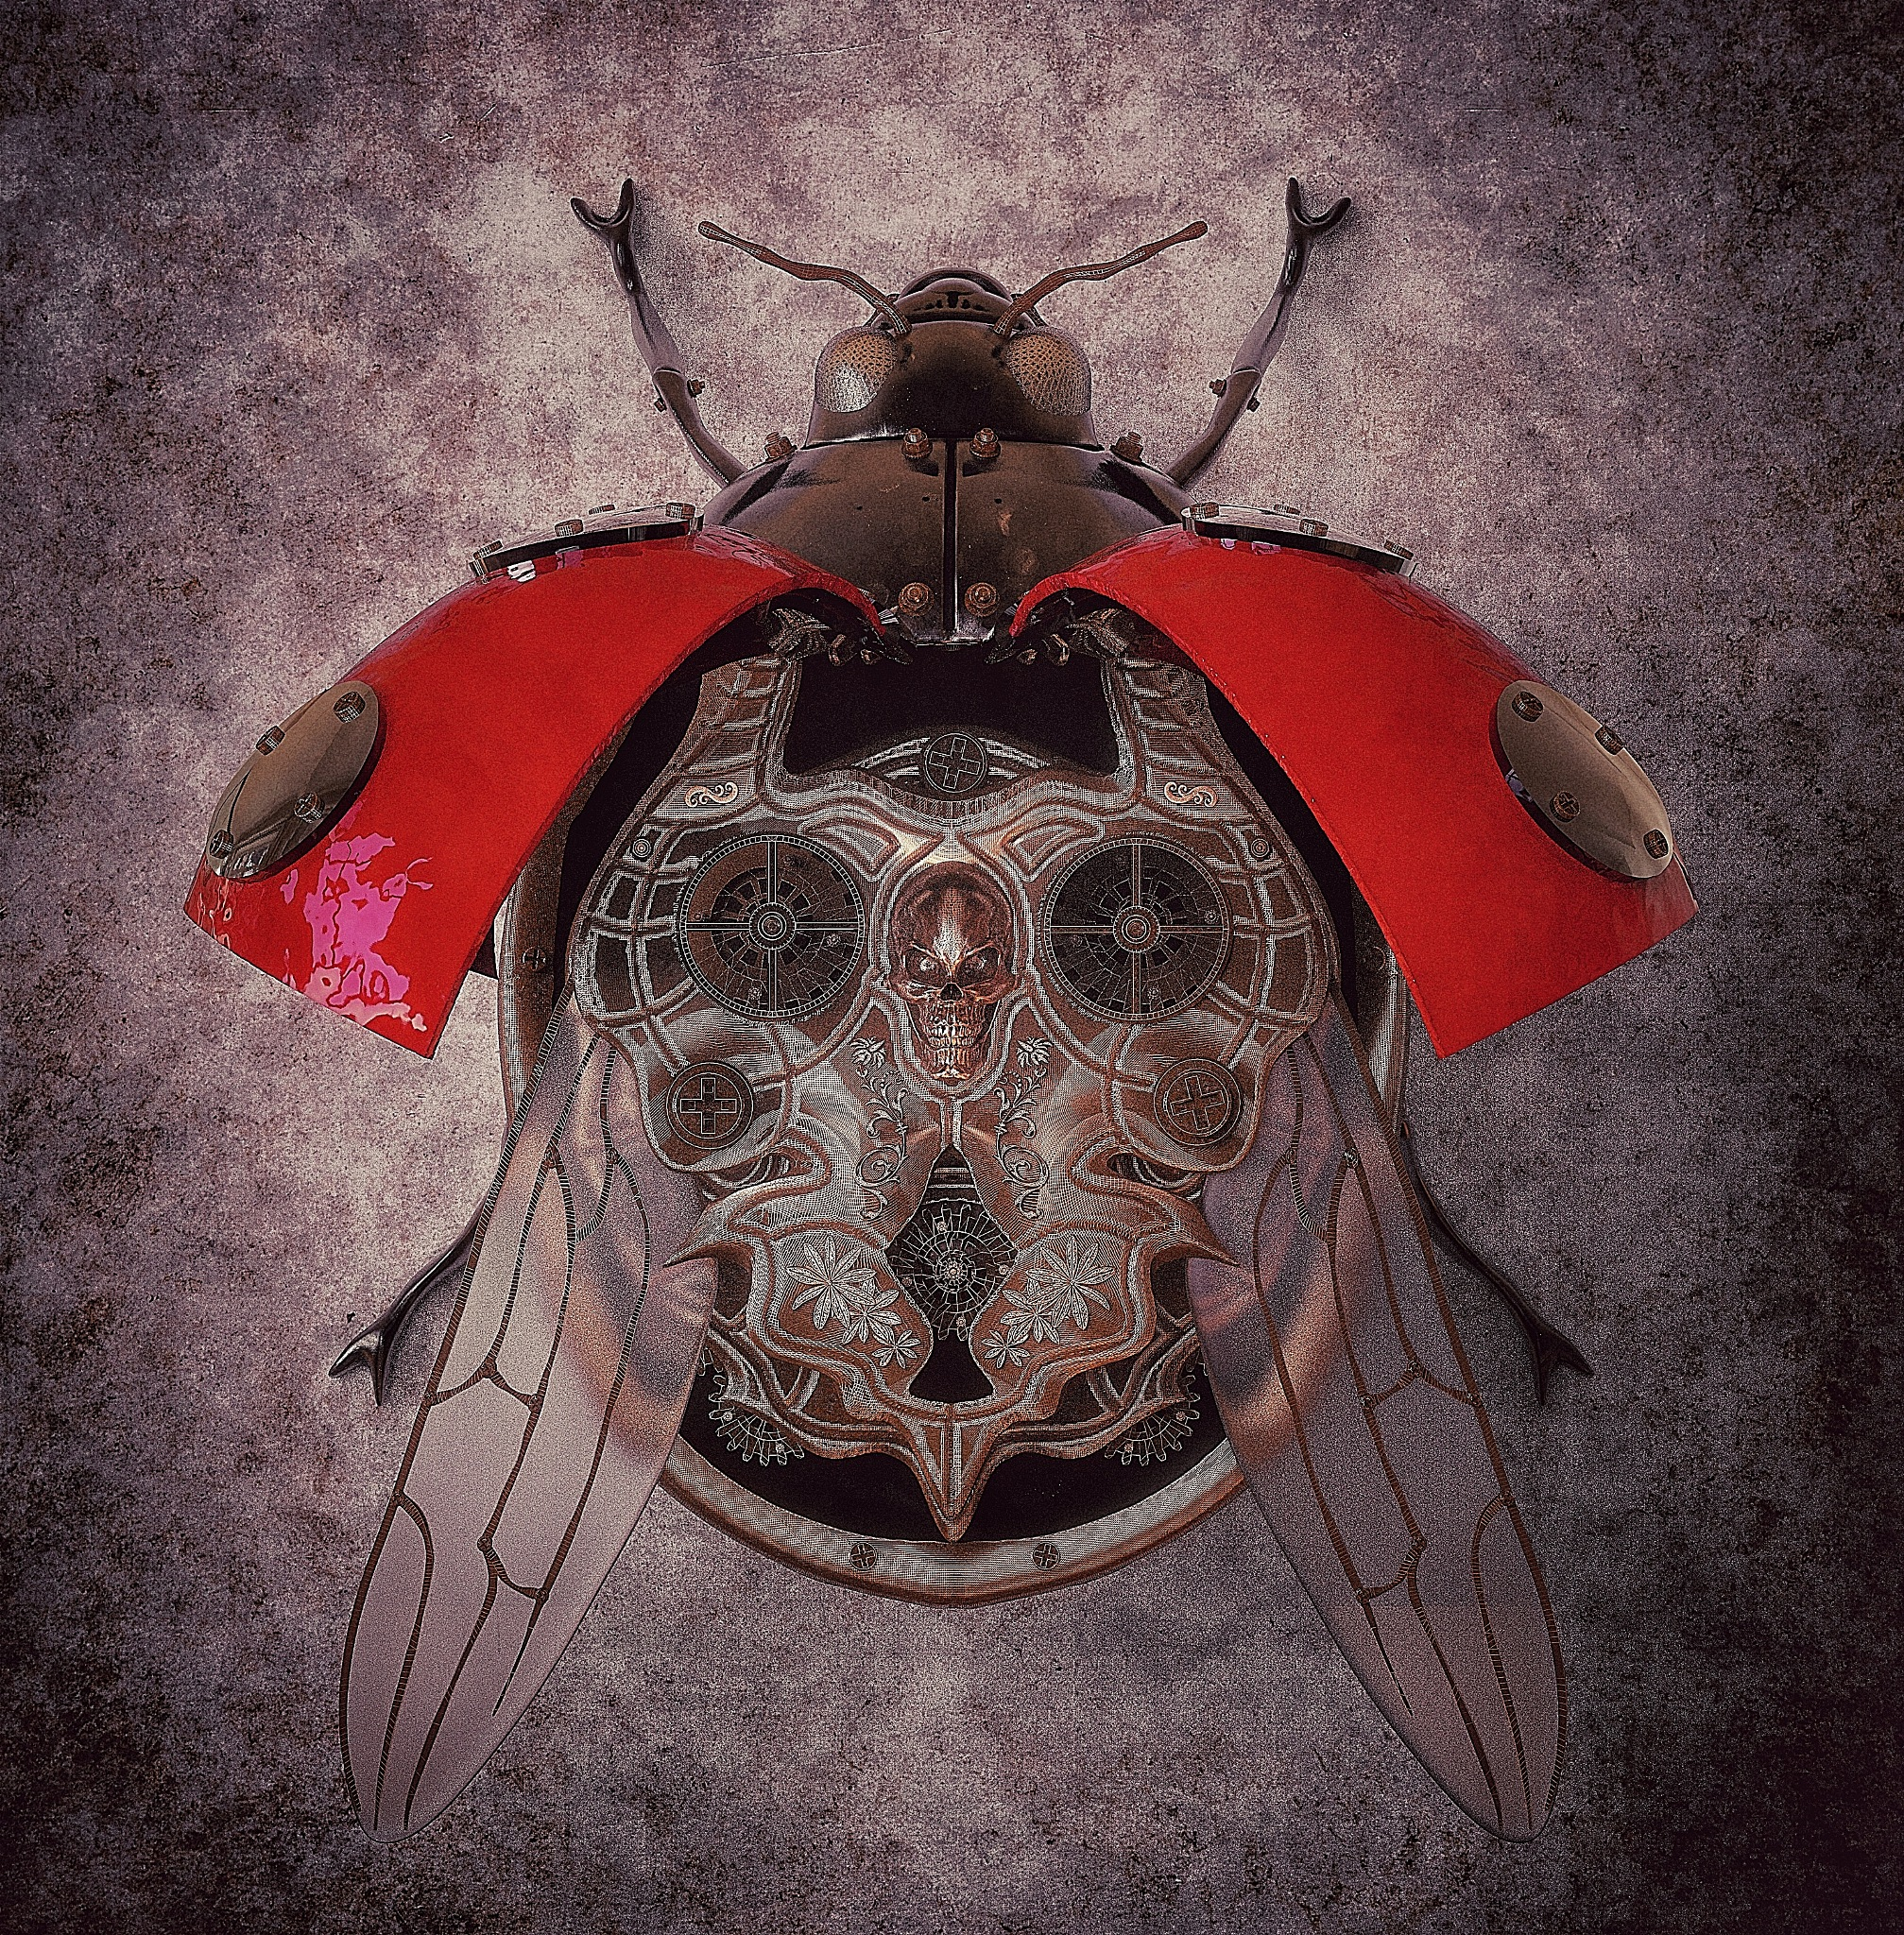 Ladybug by Oliver Kieser